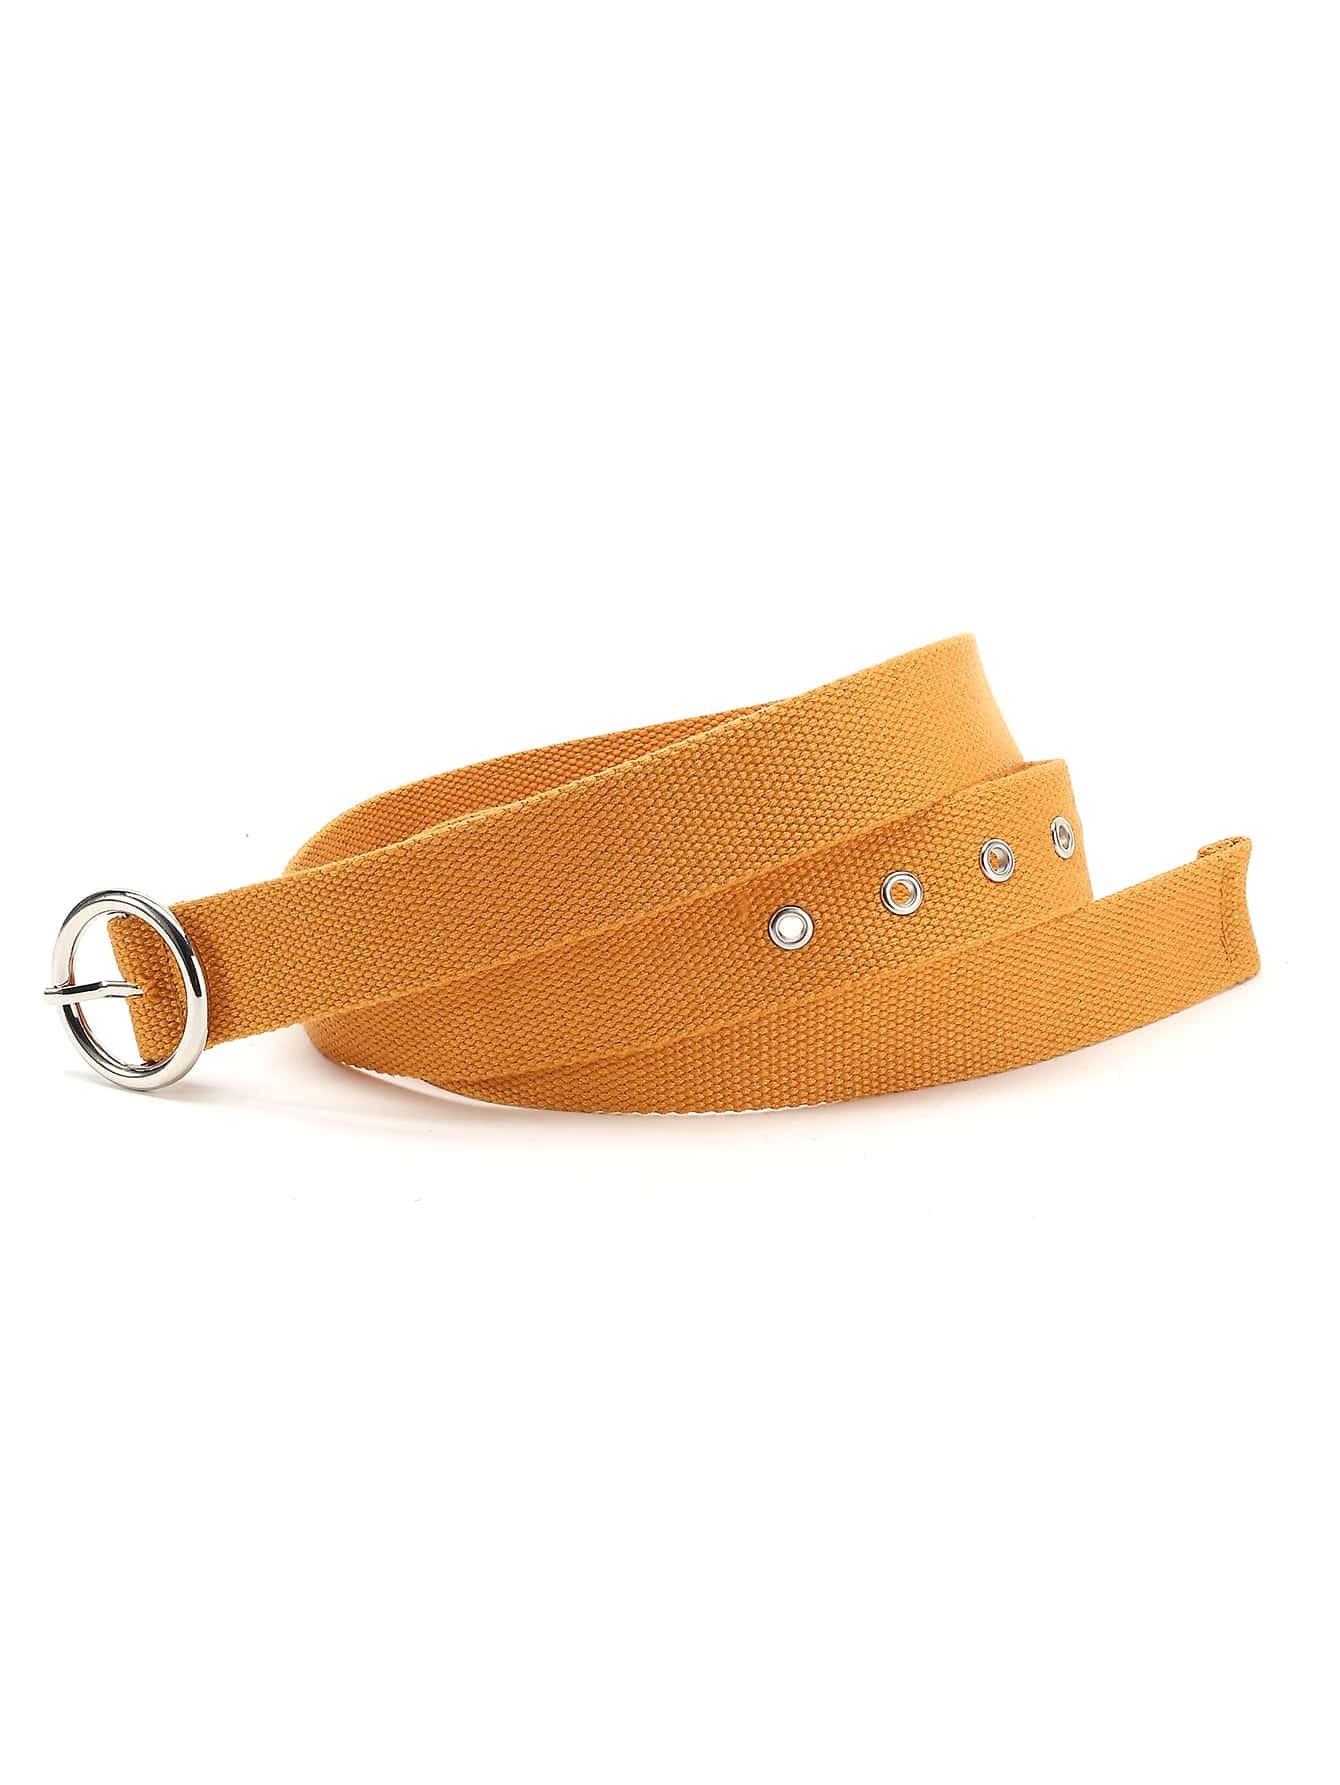 Ring Buckle Eyelet Belt